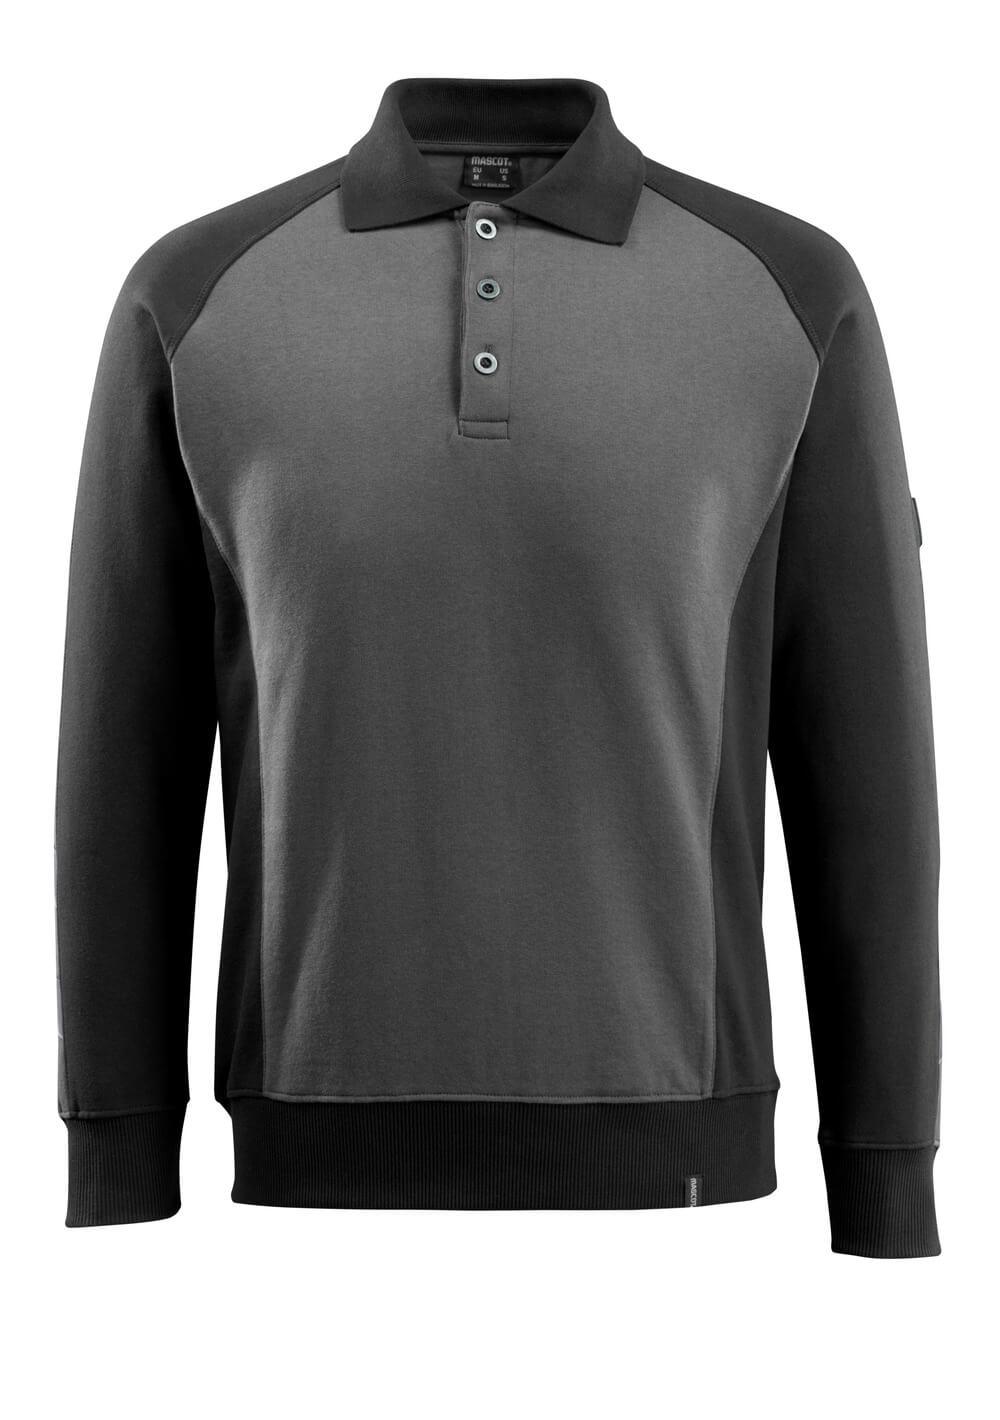 50610-962-1809 Polo Sweatshirt - dark anthracite/black